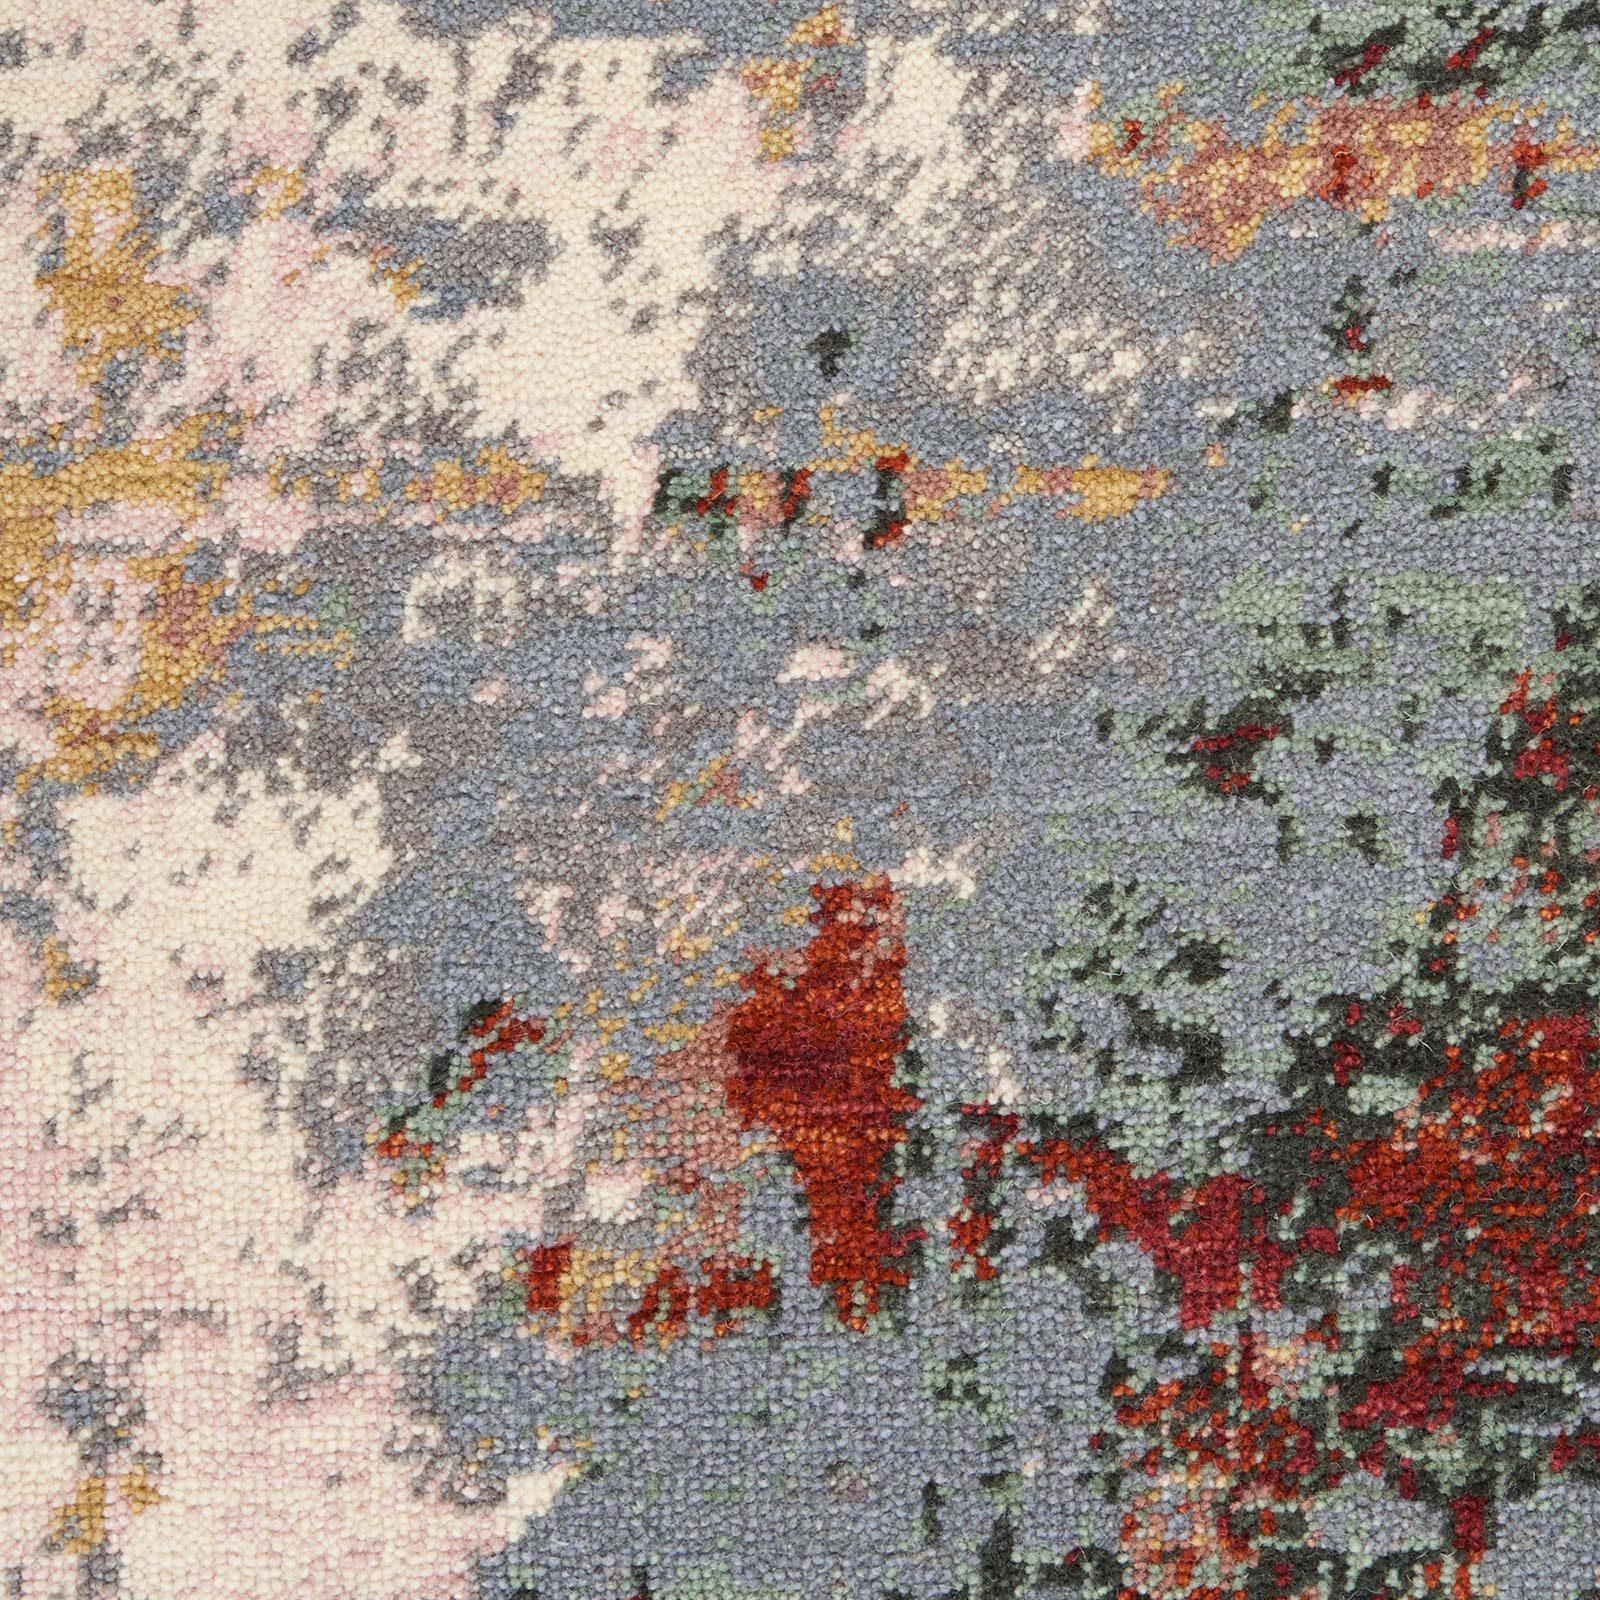 Nourison rug Artworks ATW01 SLTMT SLATE MULTI 8X10 099446709103 swatch C